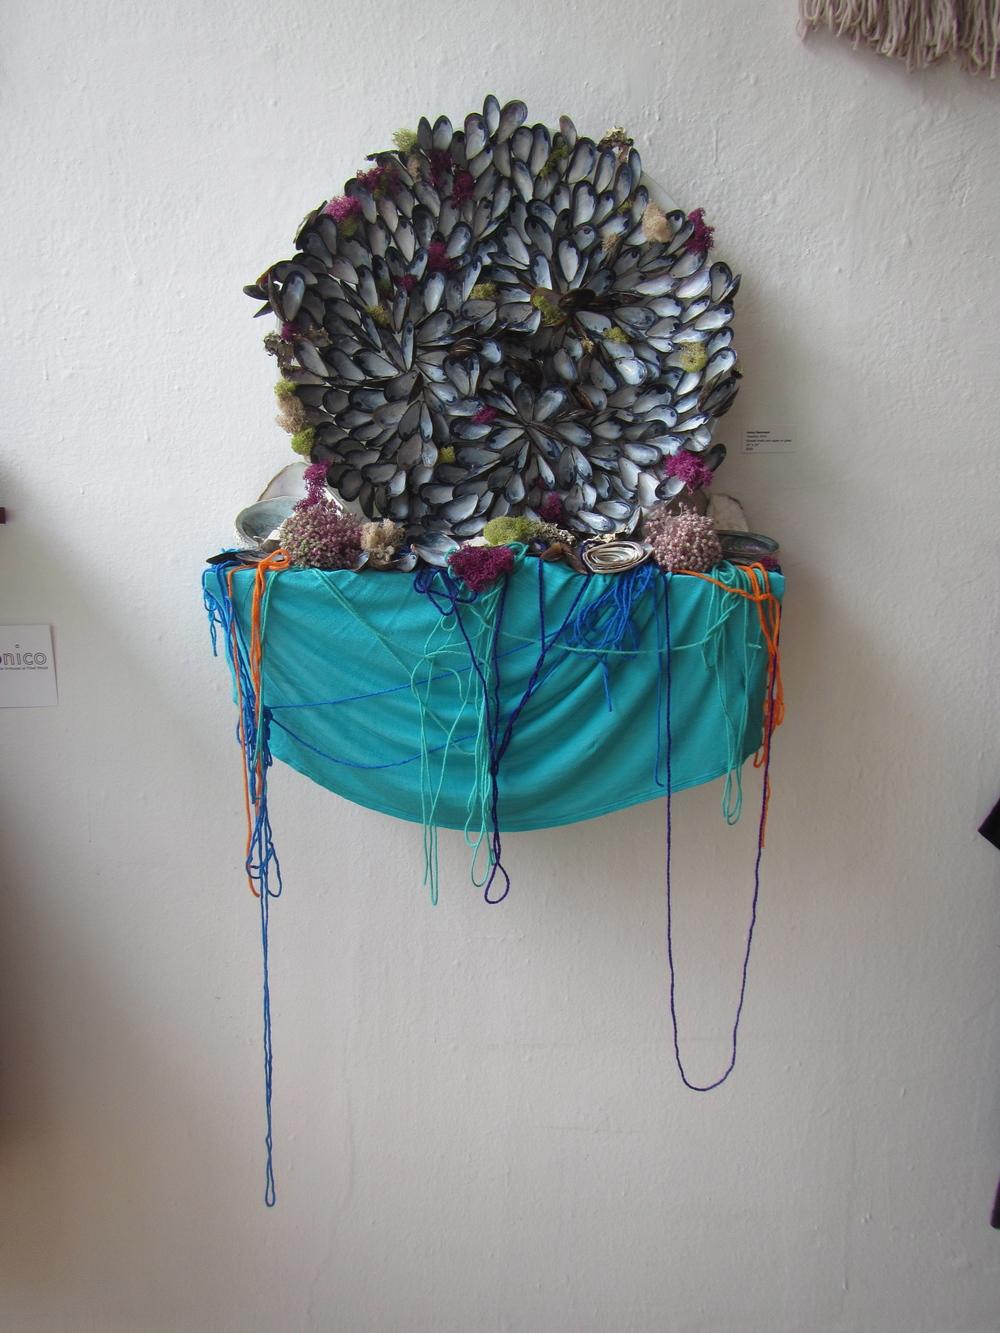 Sculpture by Jessy Gaumann.